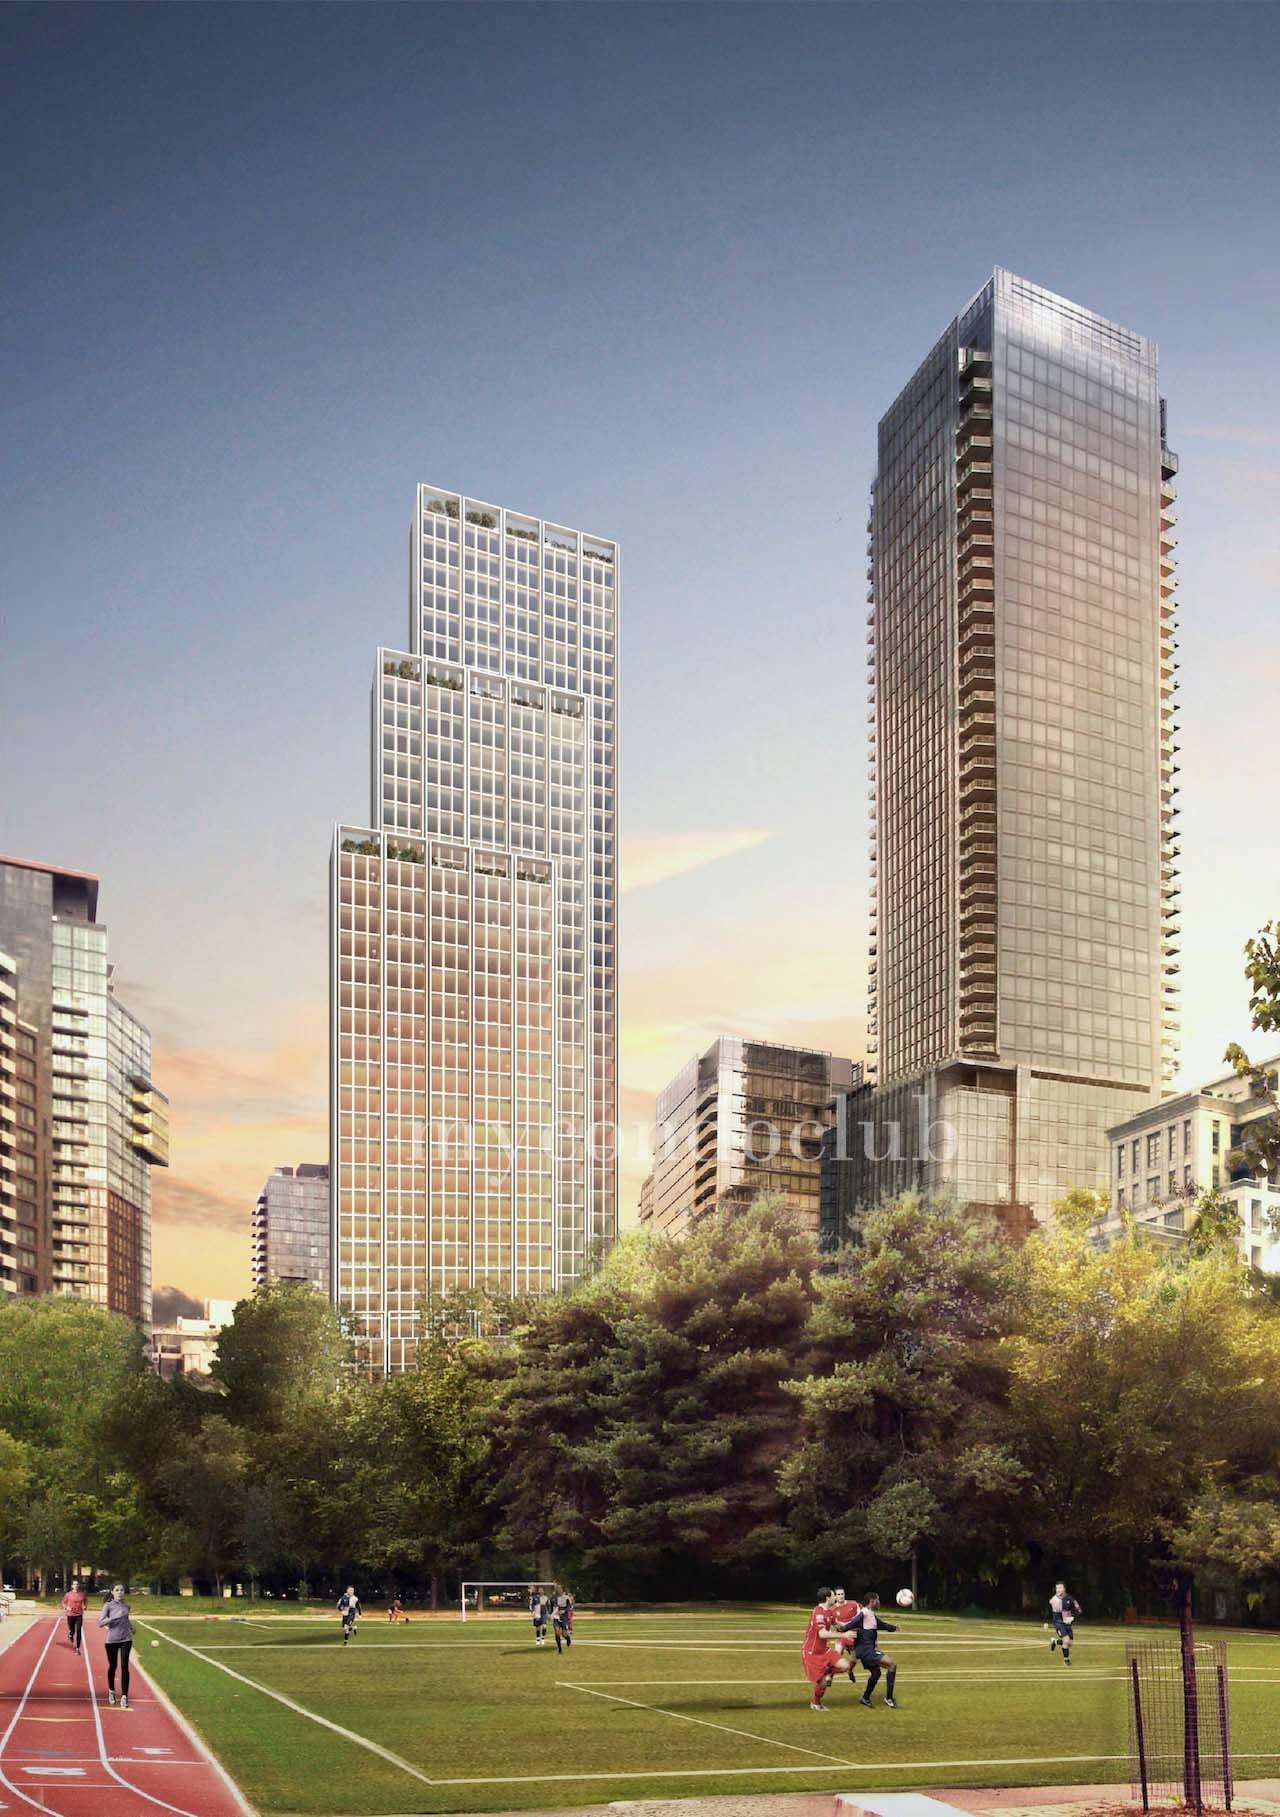 50-Scollard-Street-Condos-lanterradevelopments-DowntownToronto50ScollardStTorontoON-M5R1E9-mycondoclub